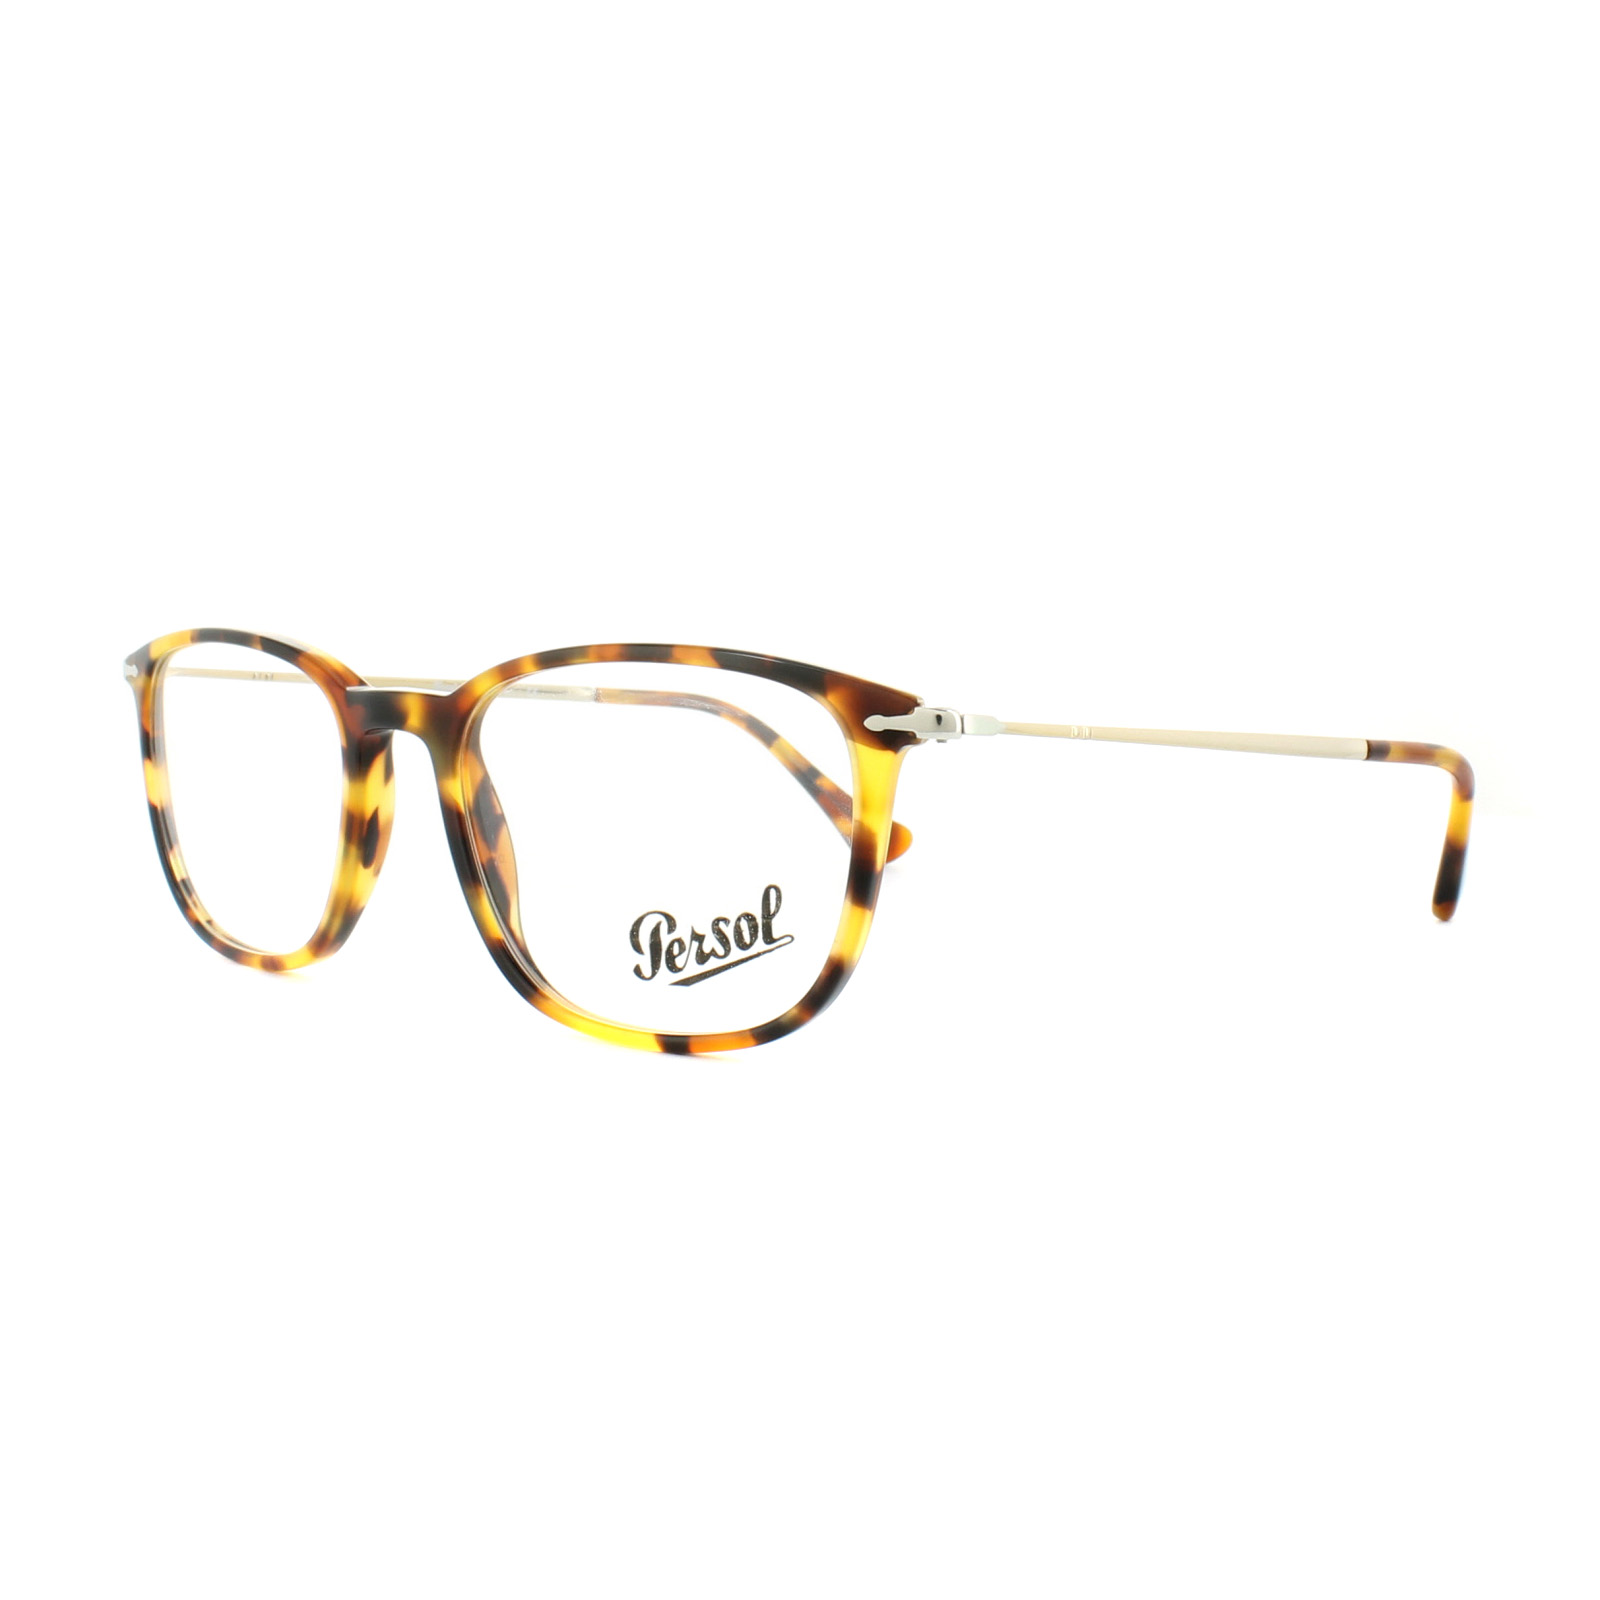 c7c3d9cf517bf Sentinel Persol Glasses Frames PO 3146V 1052 Brown Beige Tortoise Mens 51mm